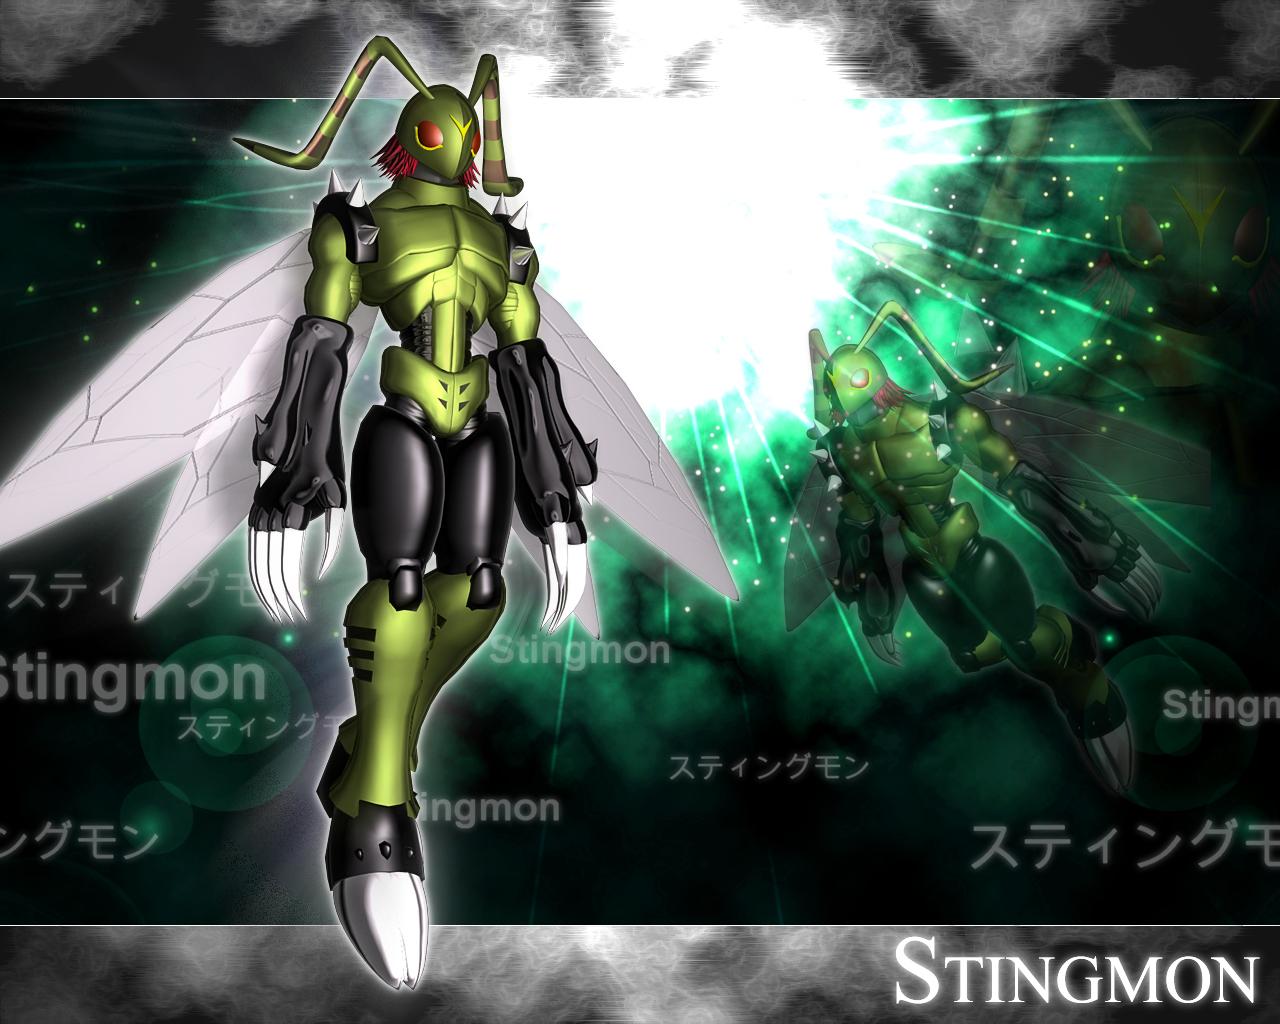 digimon stingmon - photo #32